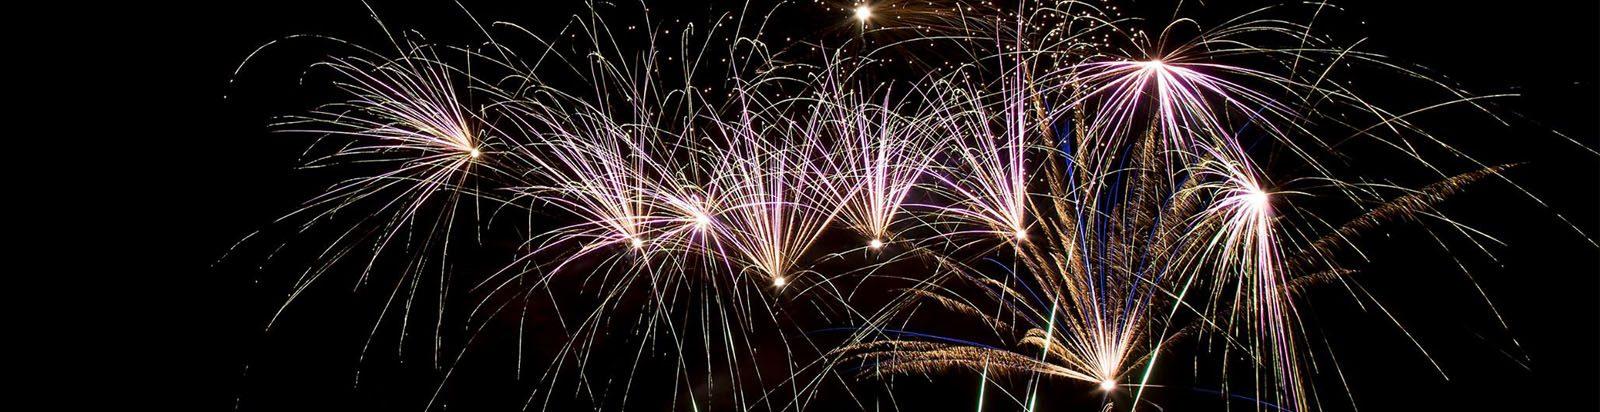 Firework Spectacular 2017 – Thank You!